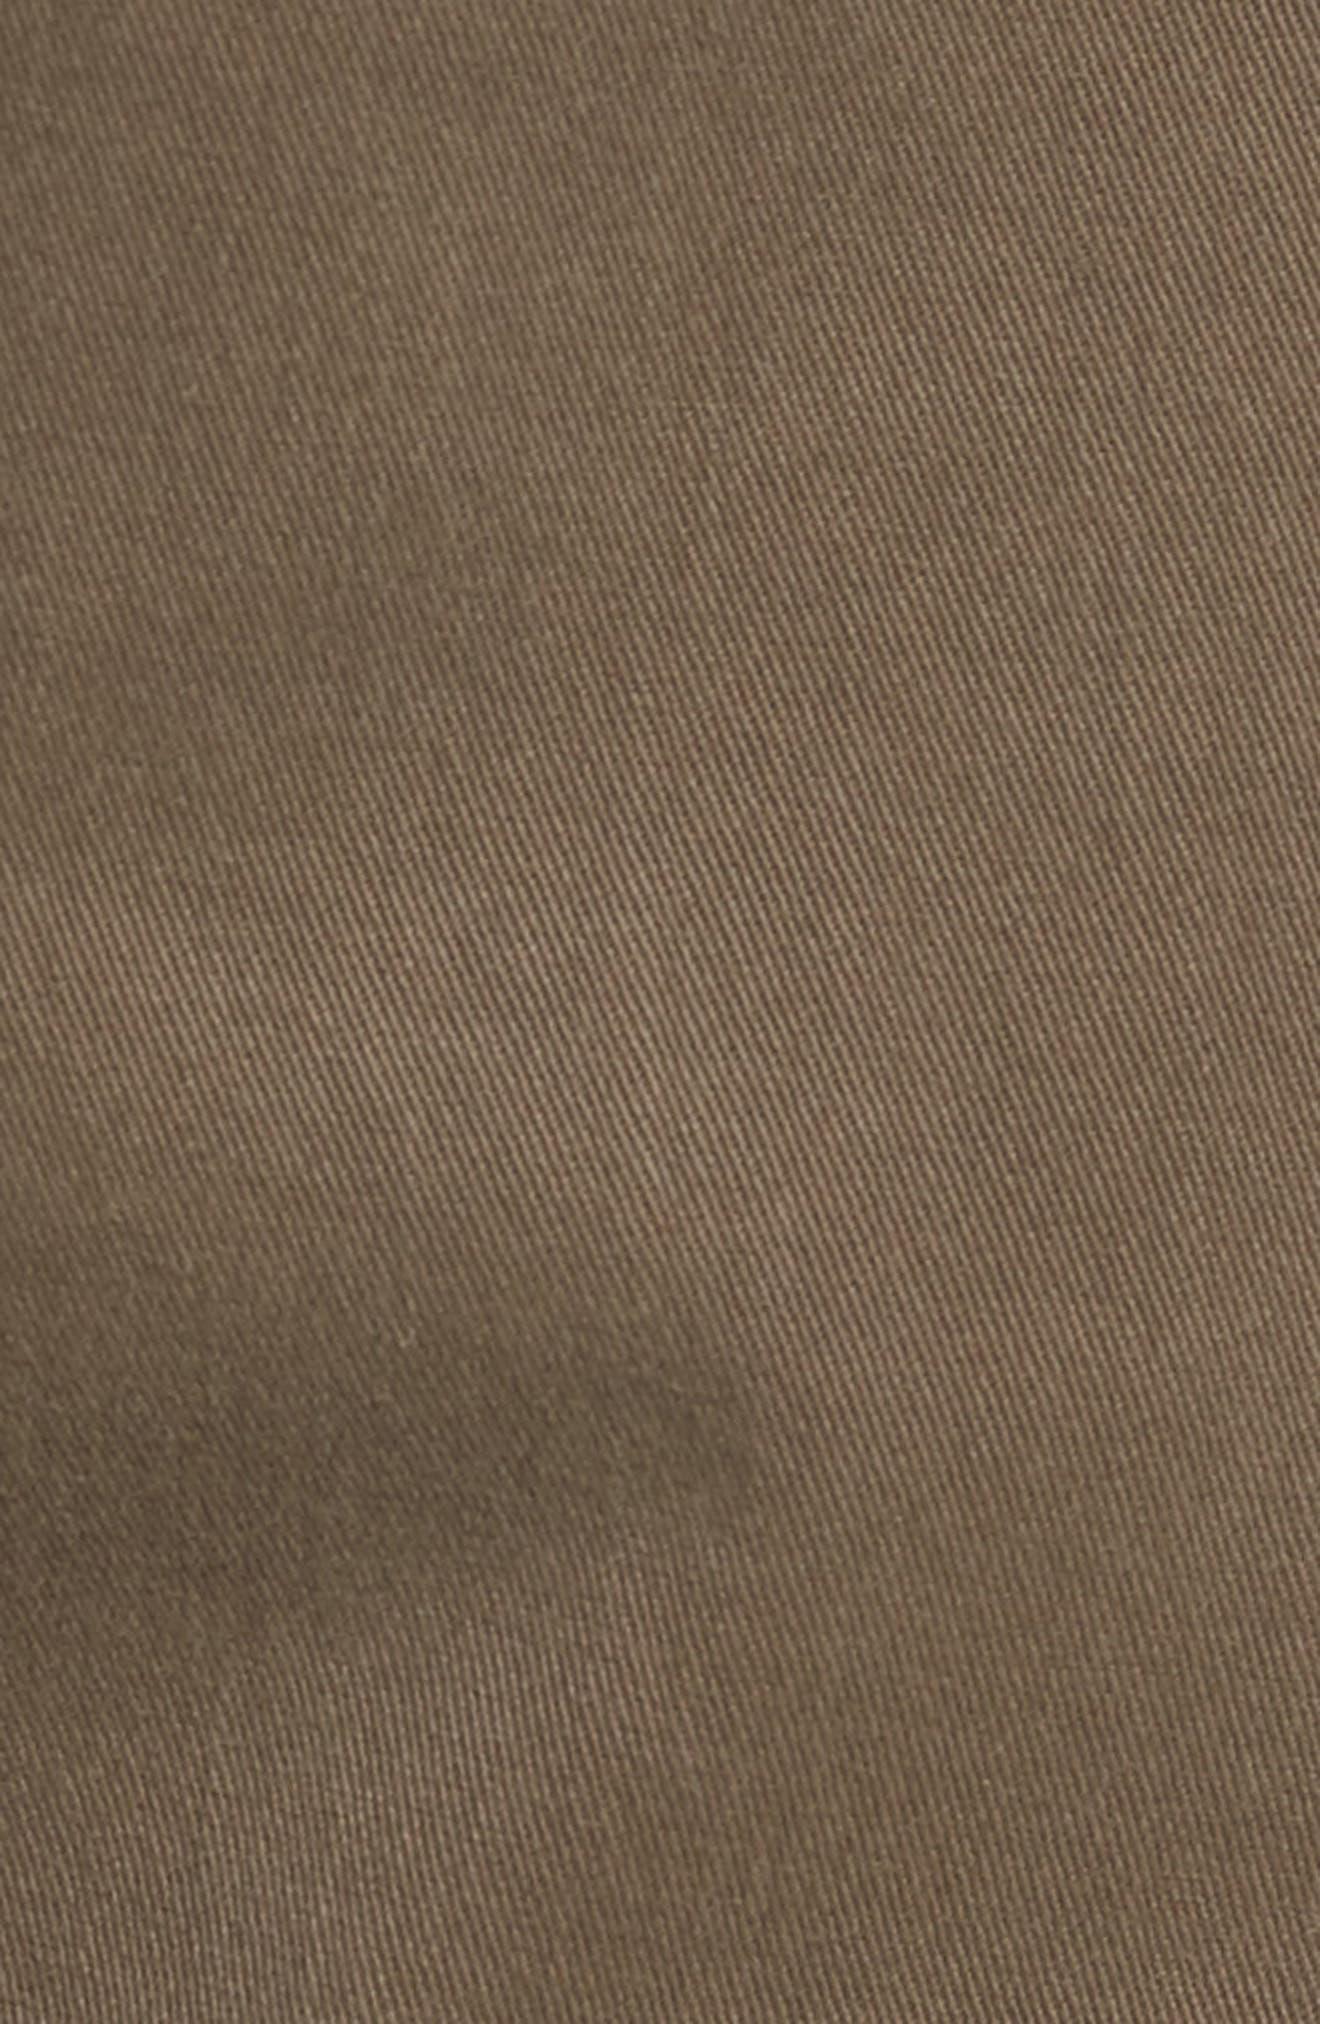 Blake Slim Fit Jeans,                             Alternate thumbnail 5, color,                             PLASTER